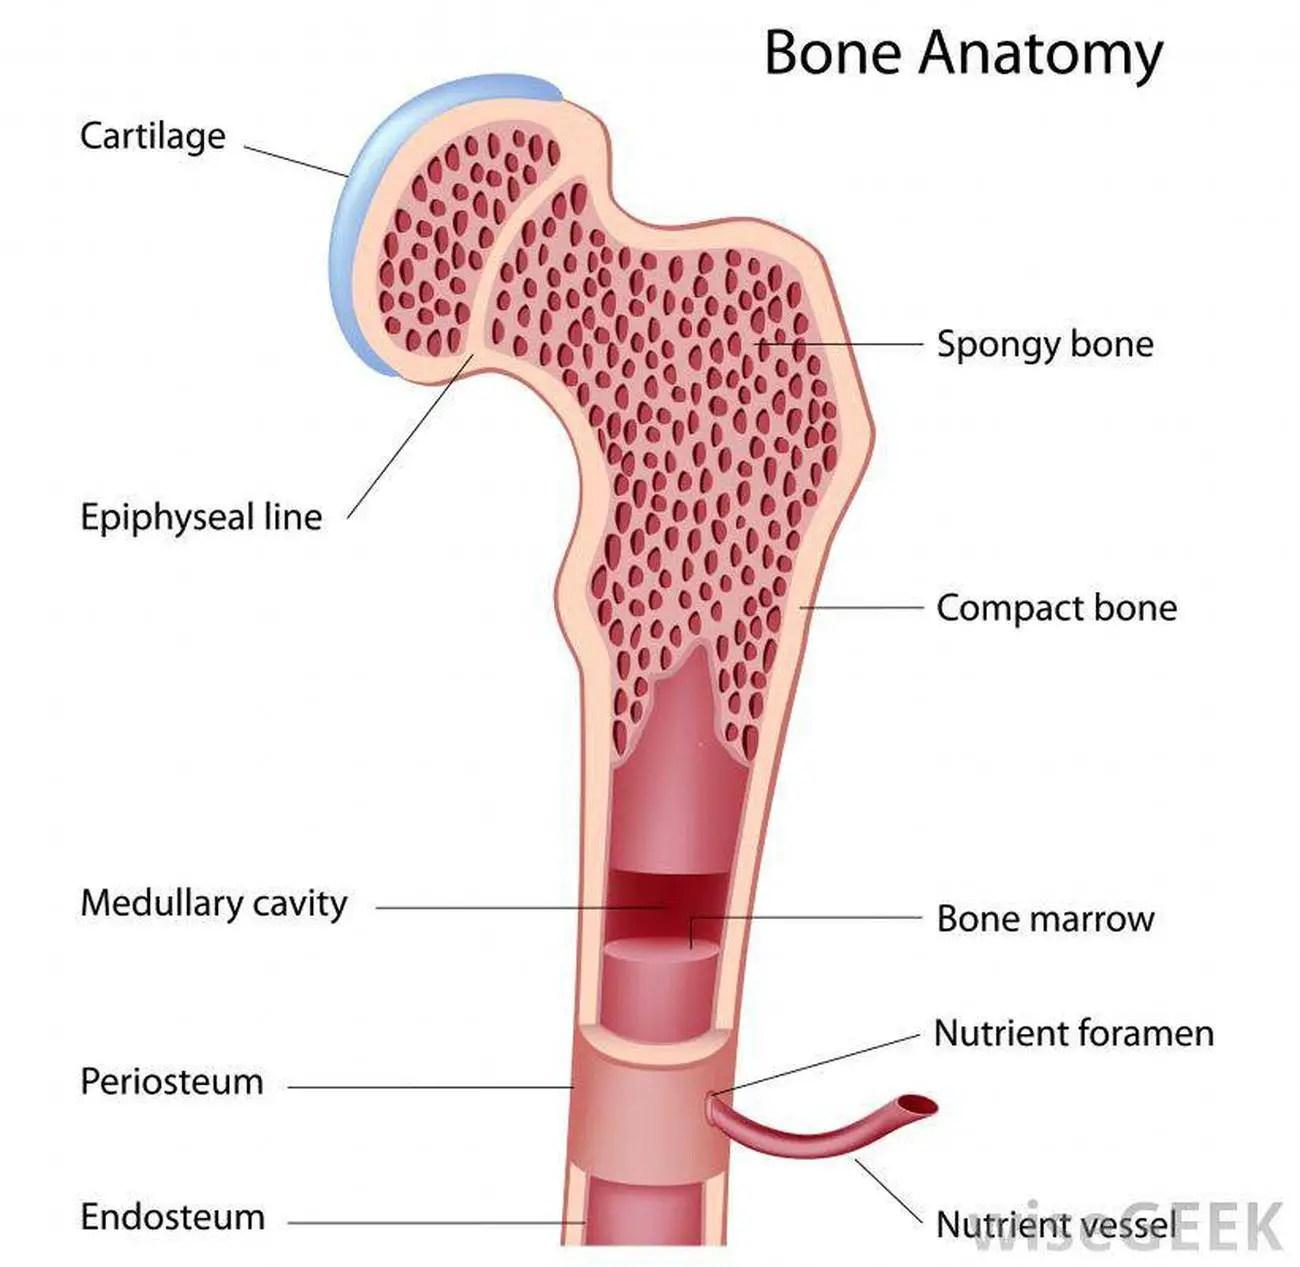 Pictures Of Bone Marrowhealthiack